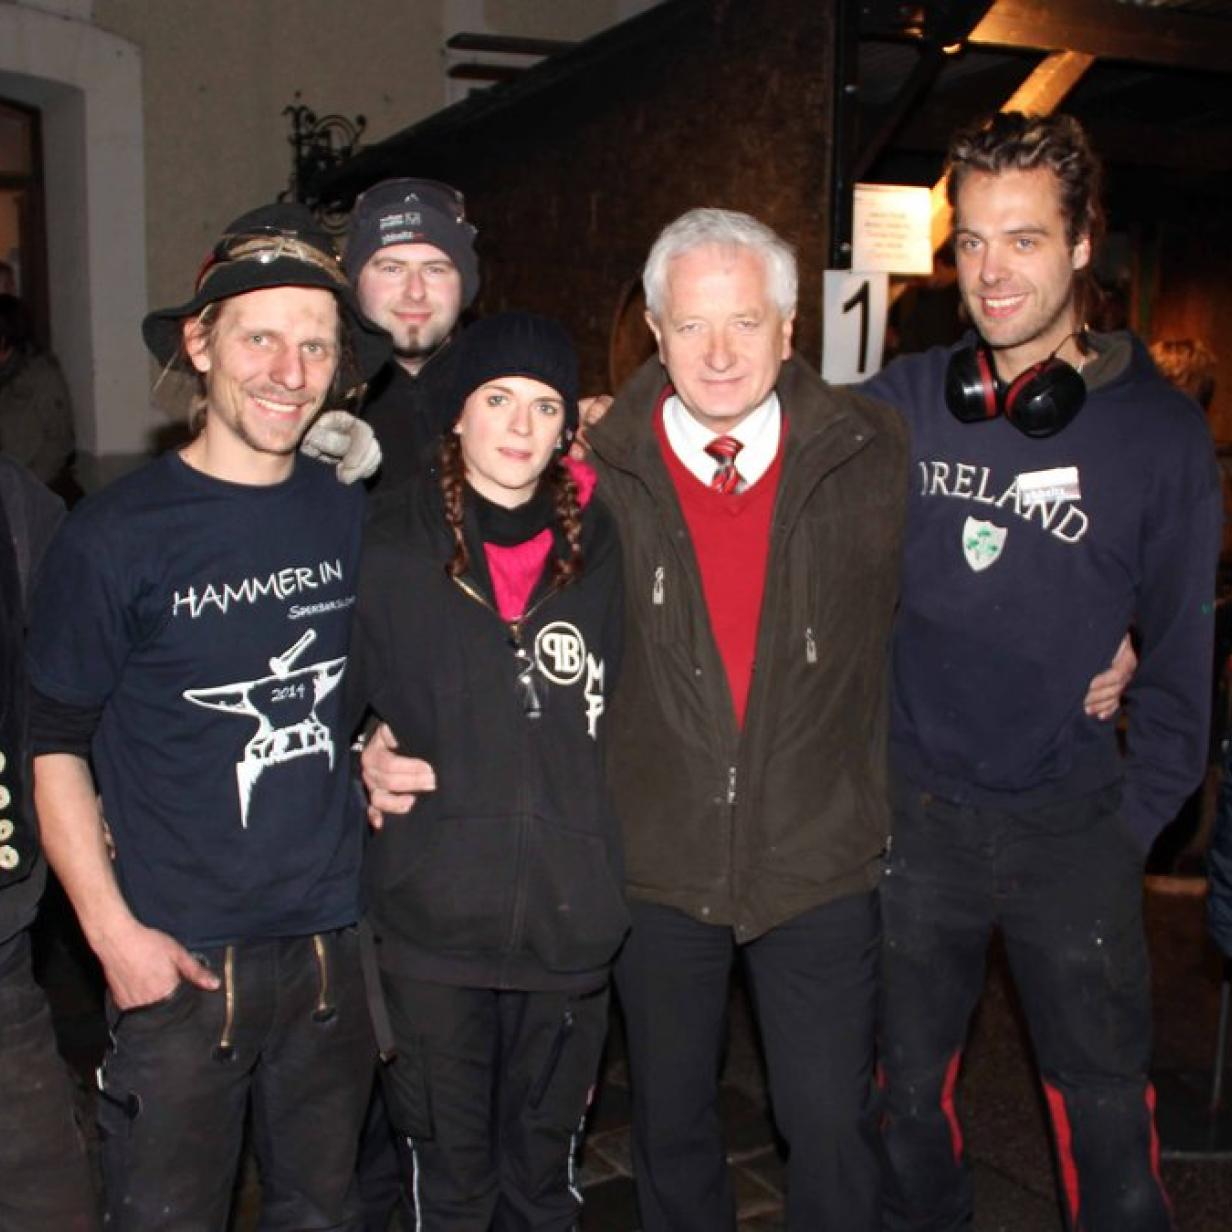 Partnersuche biker - Ybbsitz frau sucht mann - autogenitrening.comtino